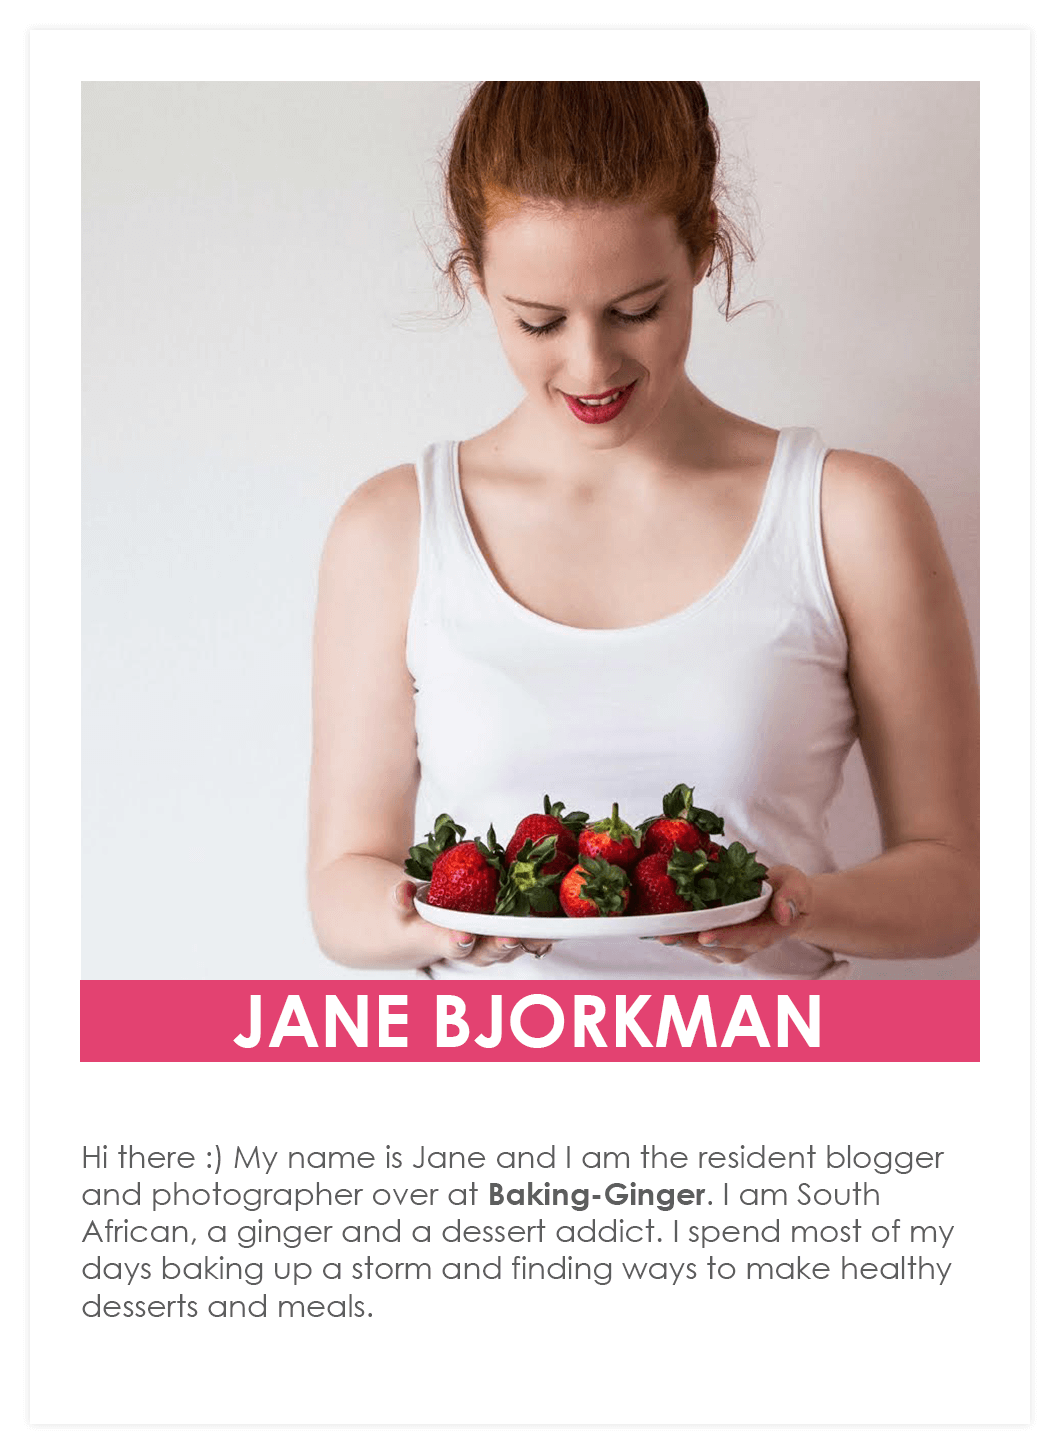 Jane Bjorkman